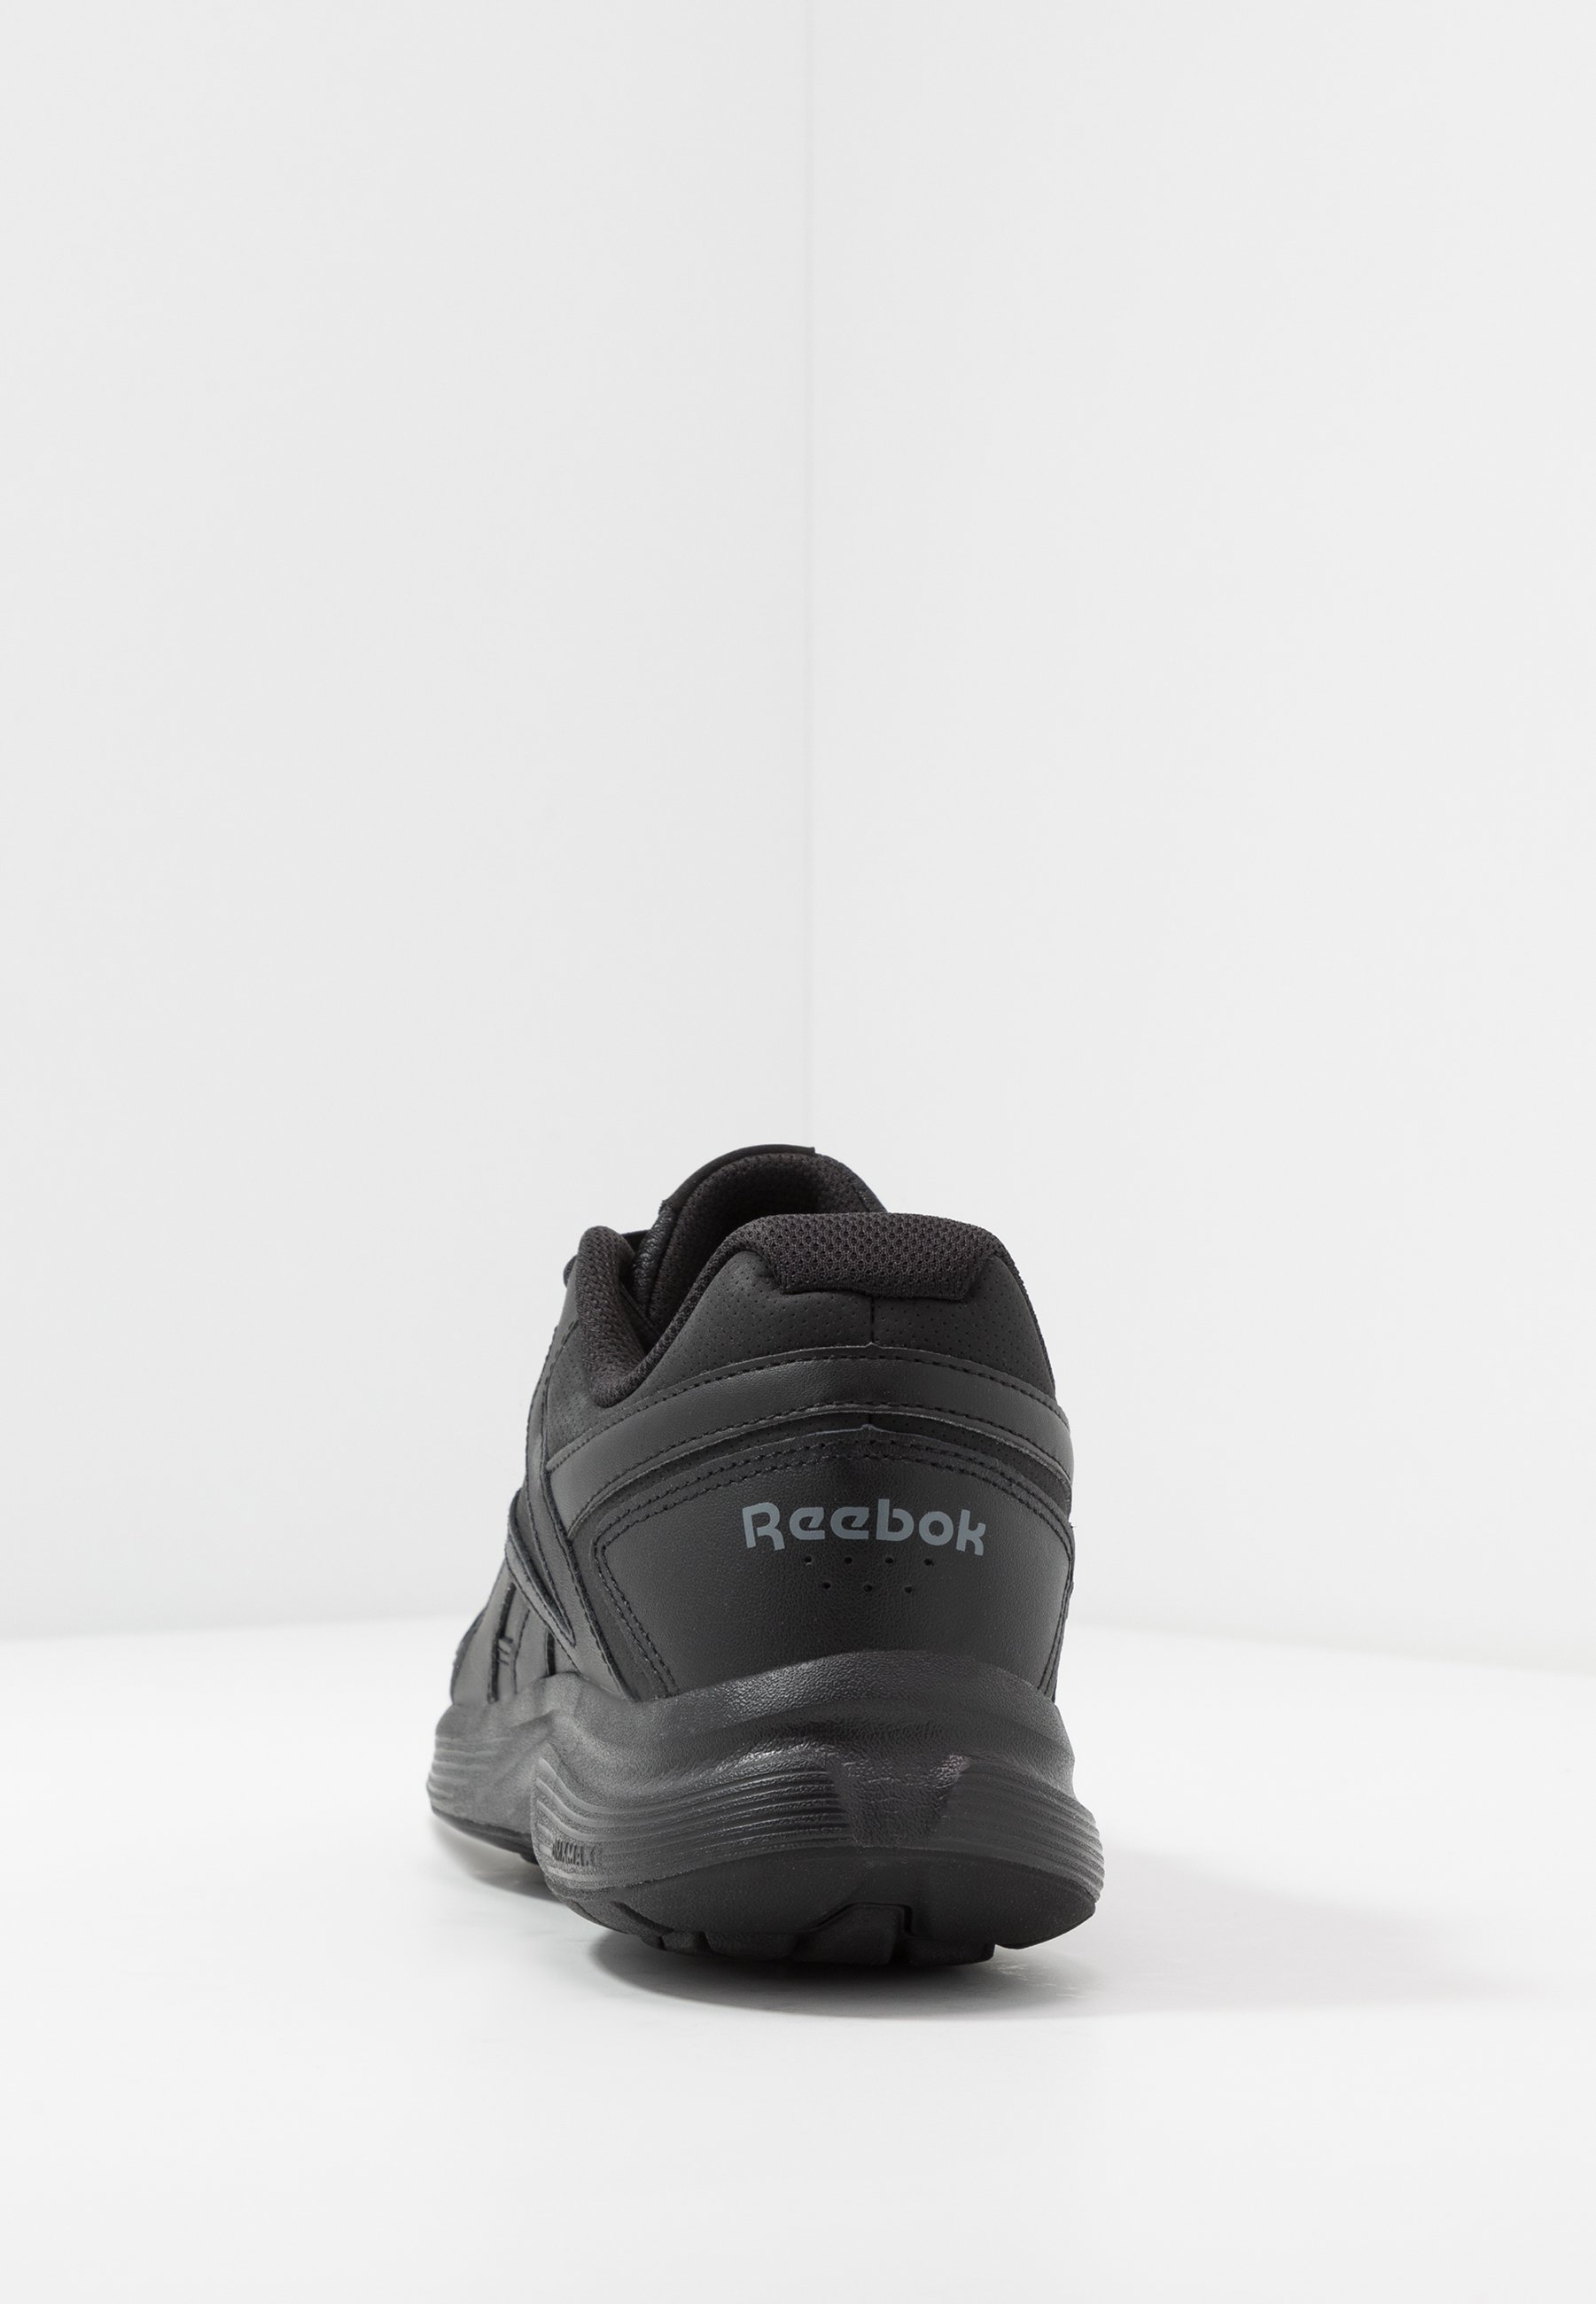 Reebok Walk Ultra 7 Dmx Max - Vandresko Black/cold Grey/collegiate Royal